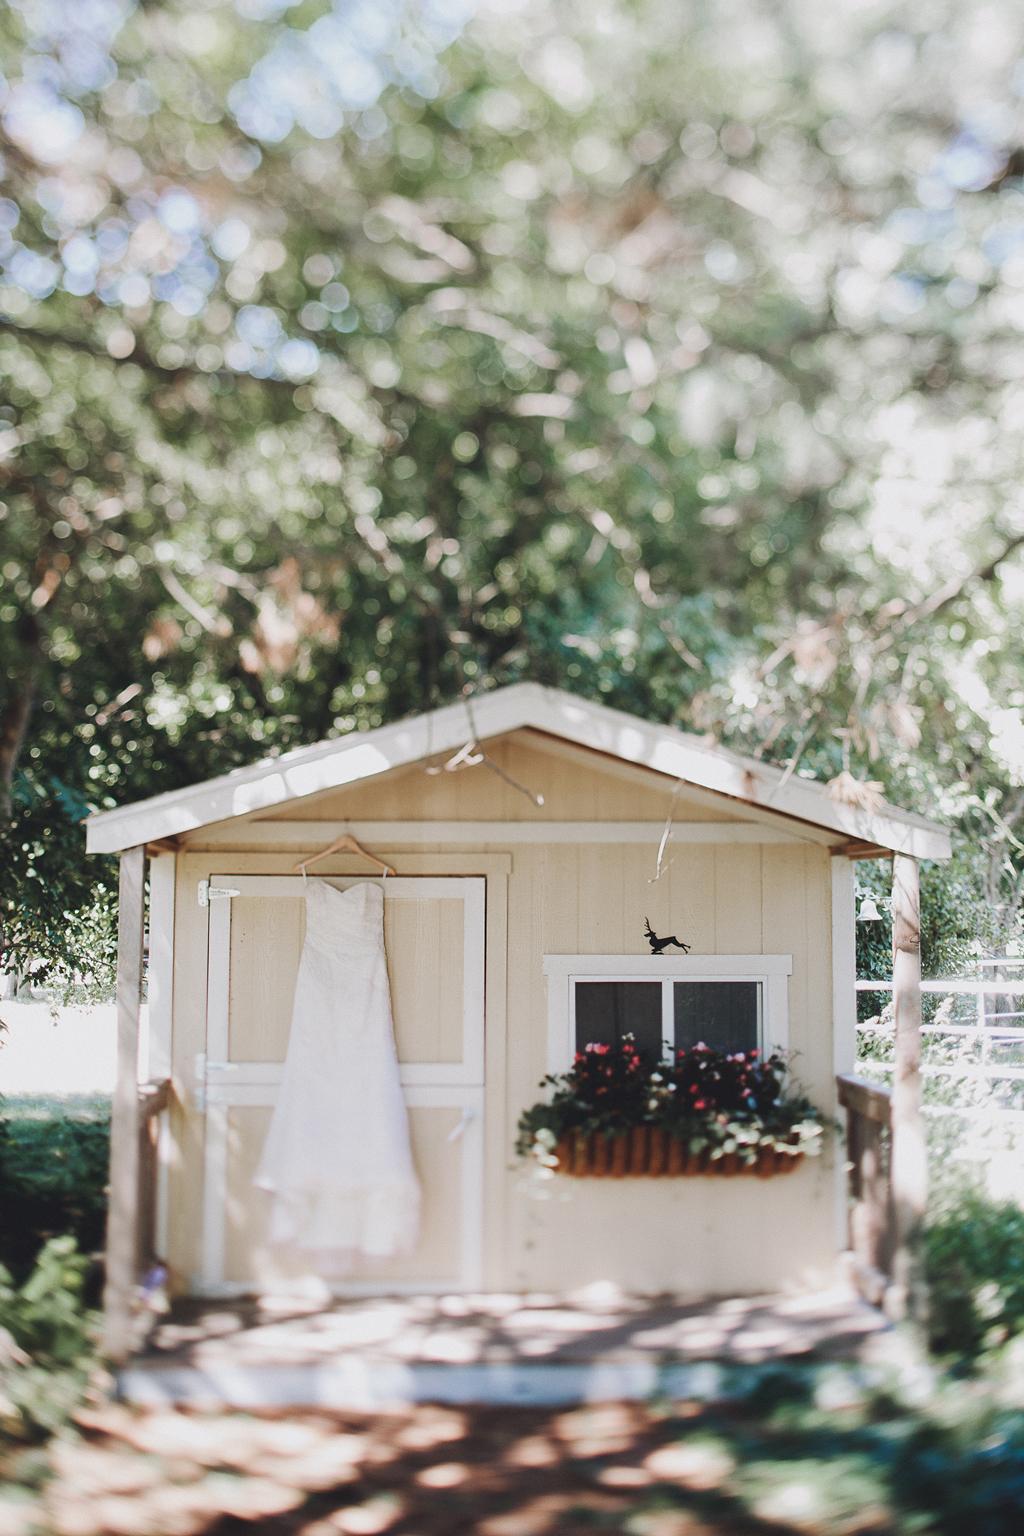 Nebraska Midwest Tent Wedding Dress